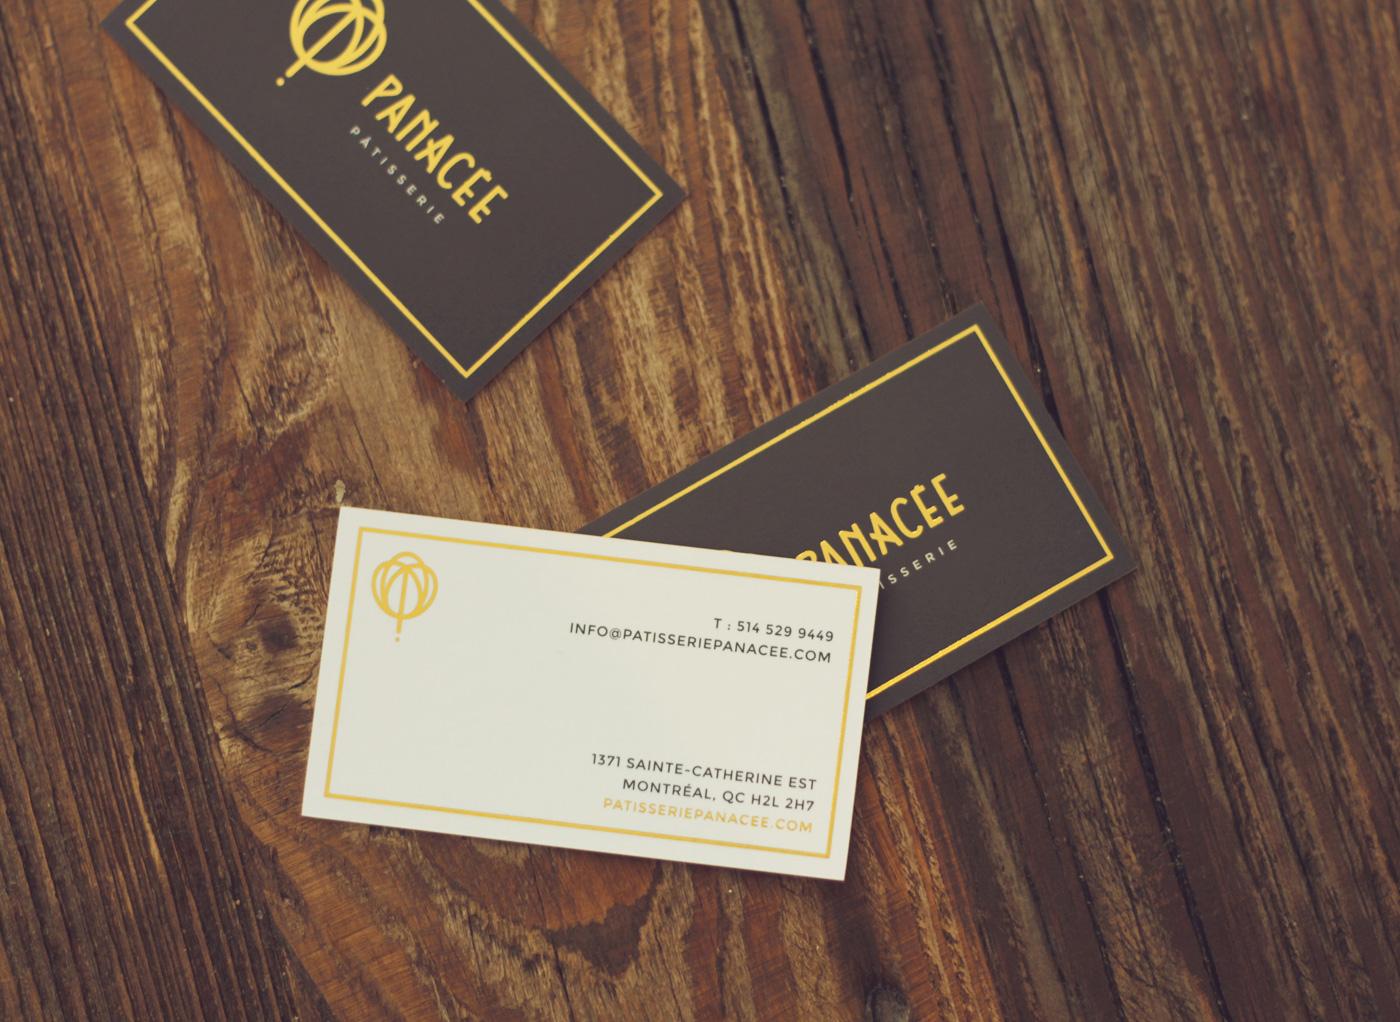 Business Cards design for Panacée